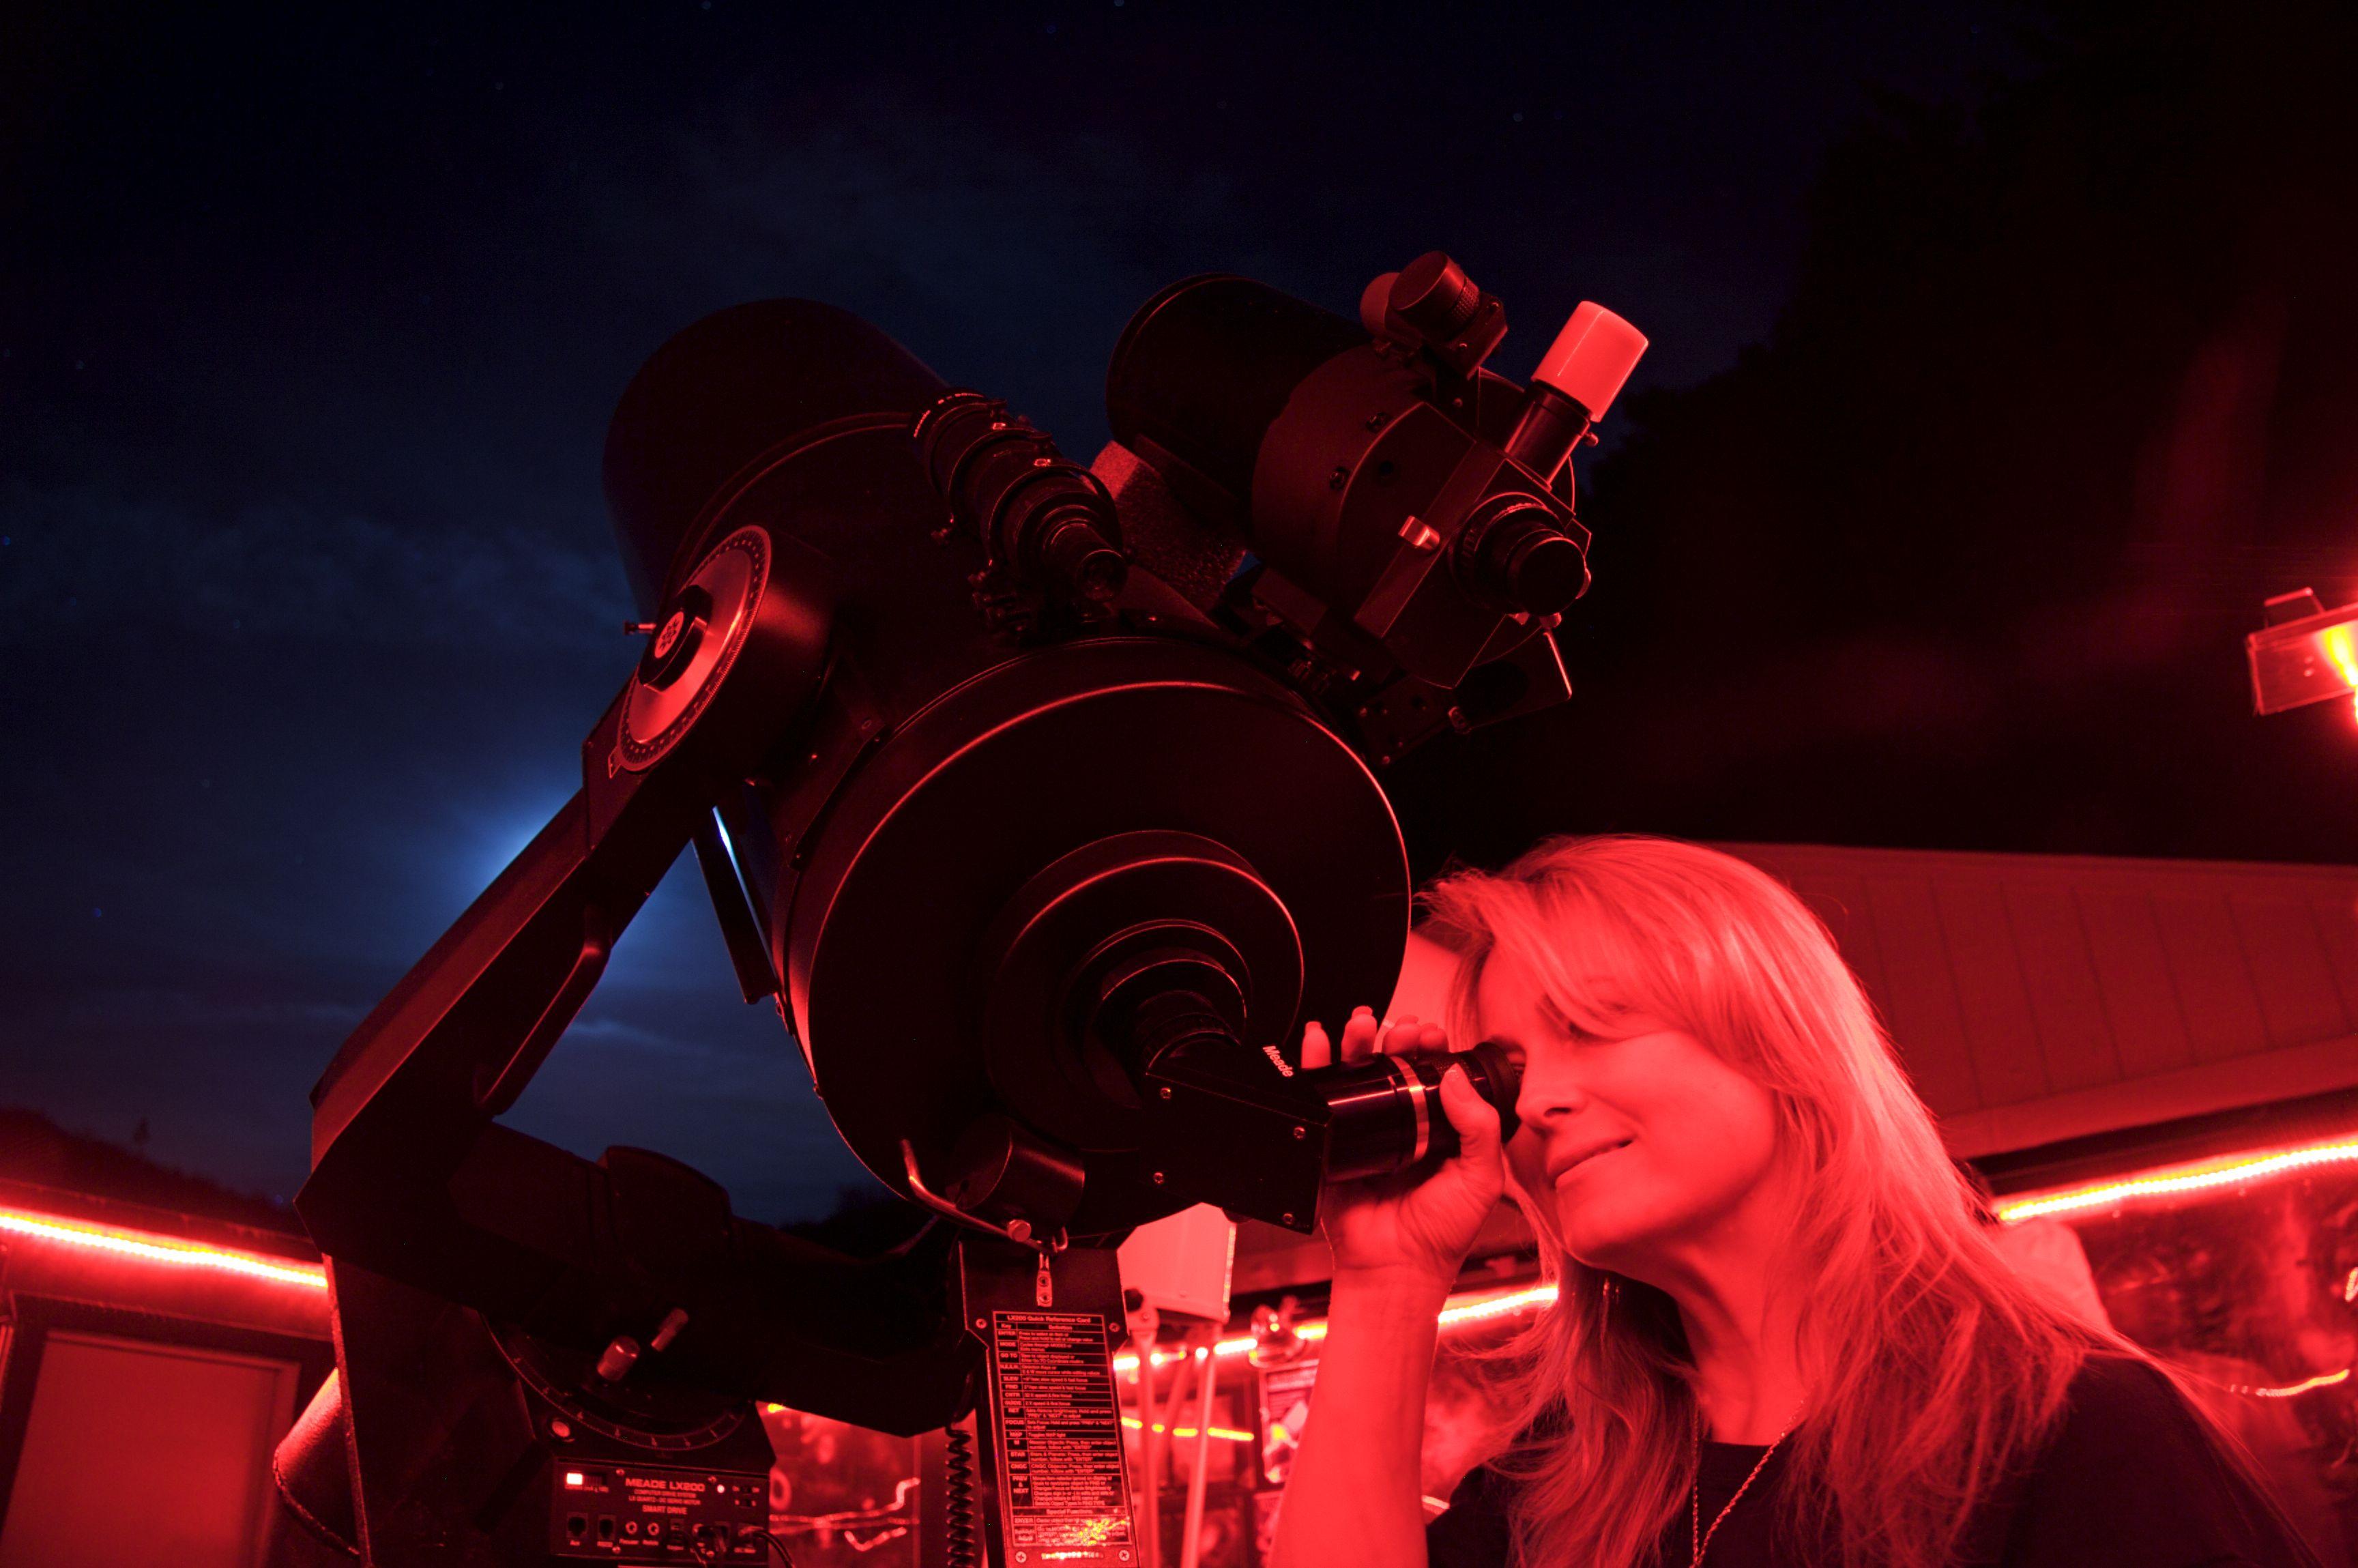 Woman Looking Through a Telescope